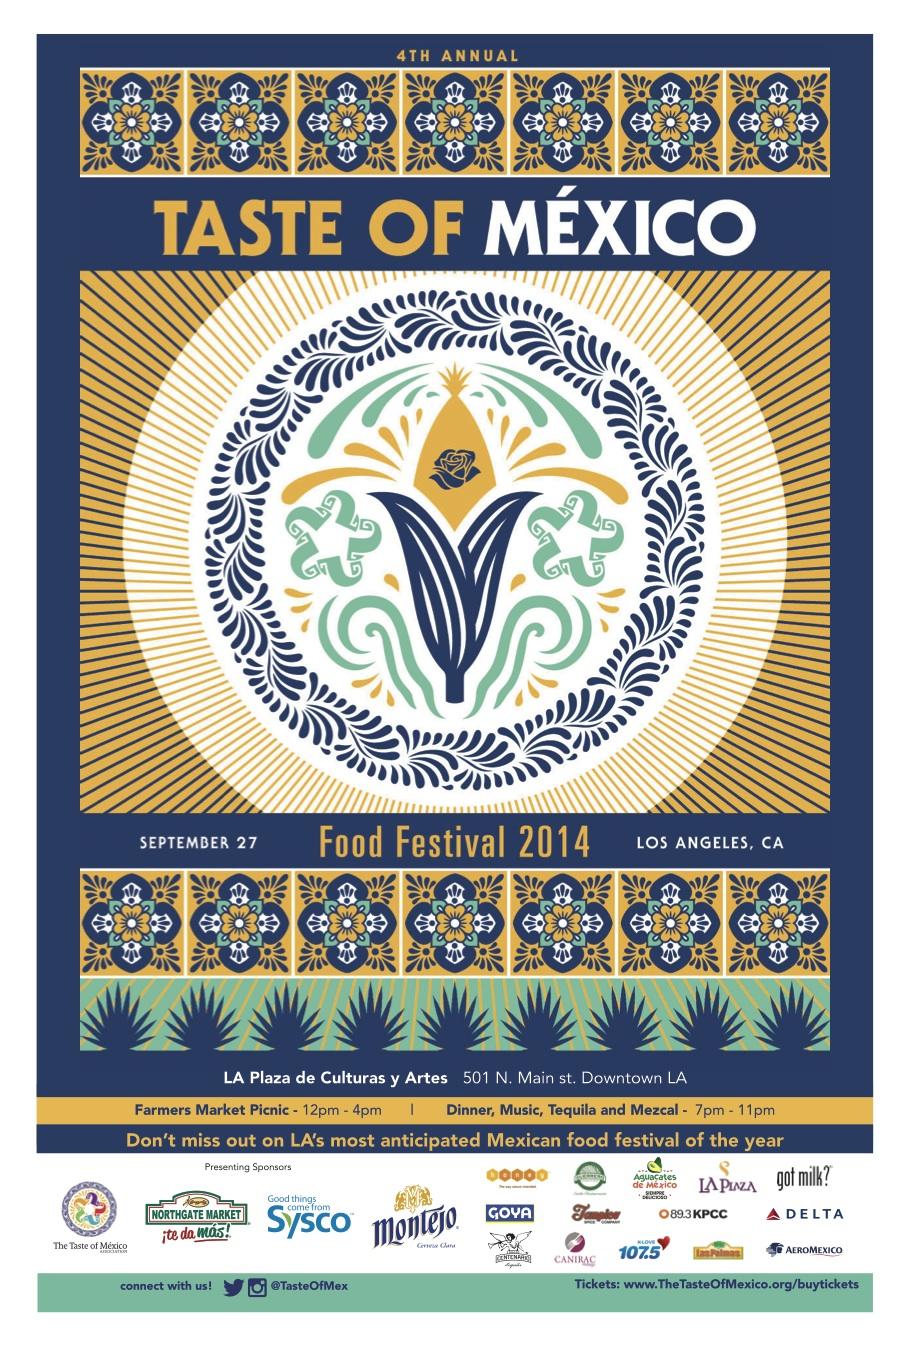 tasteofmexicofoodfestival2014.jpg